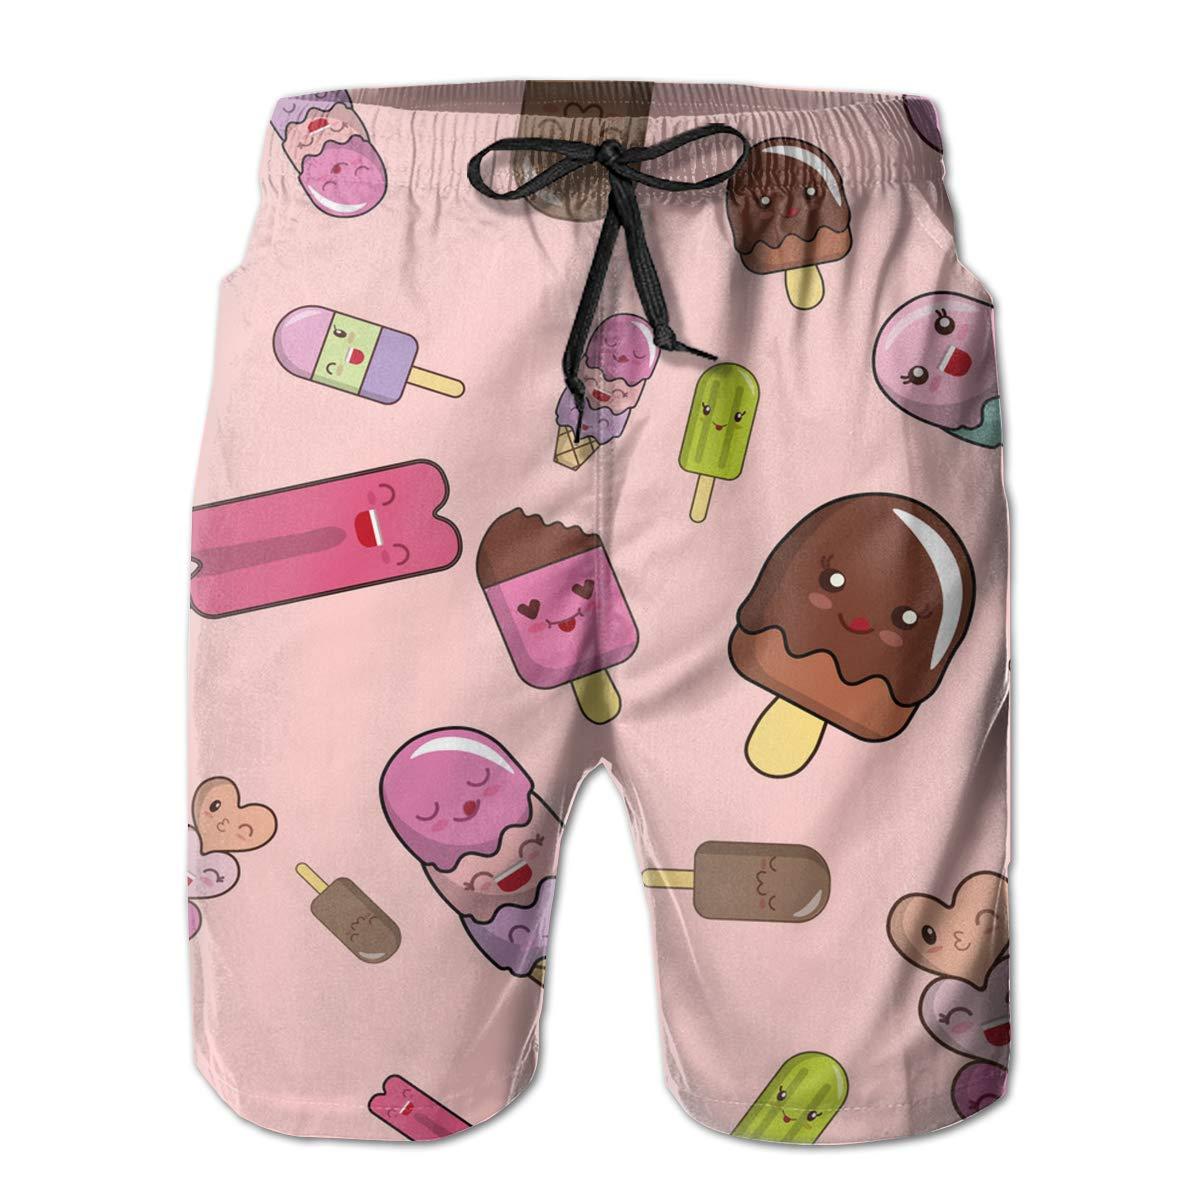 SARA NELL Mens Swim Trunks Cute Ice Cream Pink Surfing Beach Board Shorts Swimwear